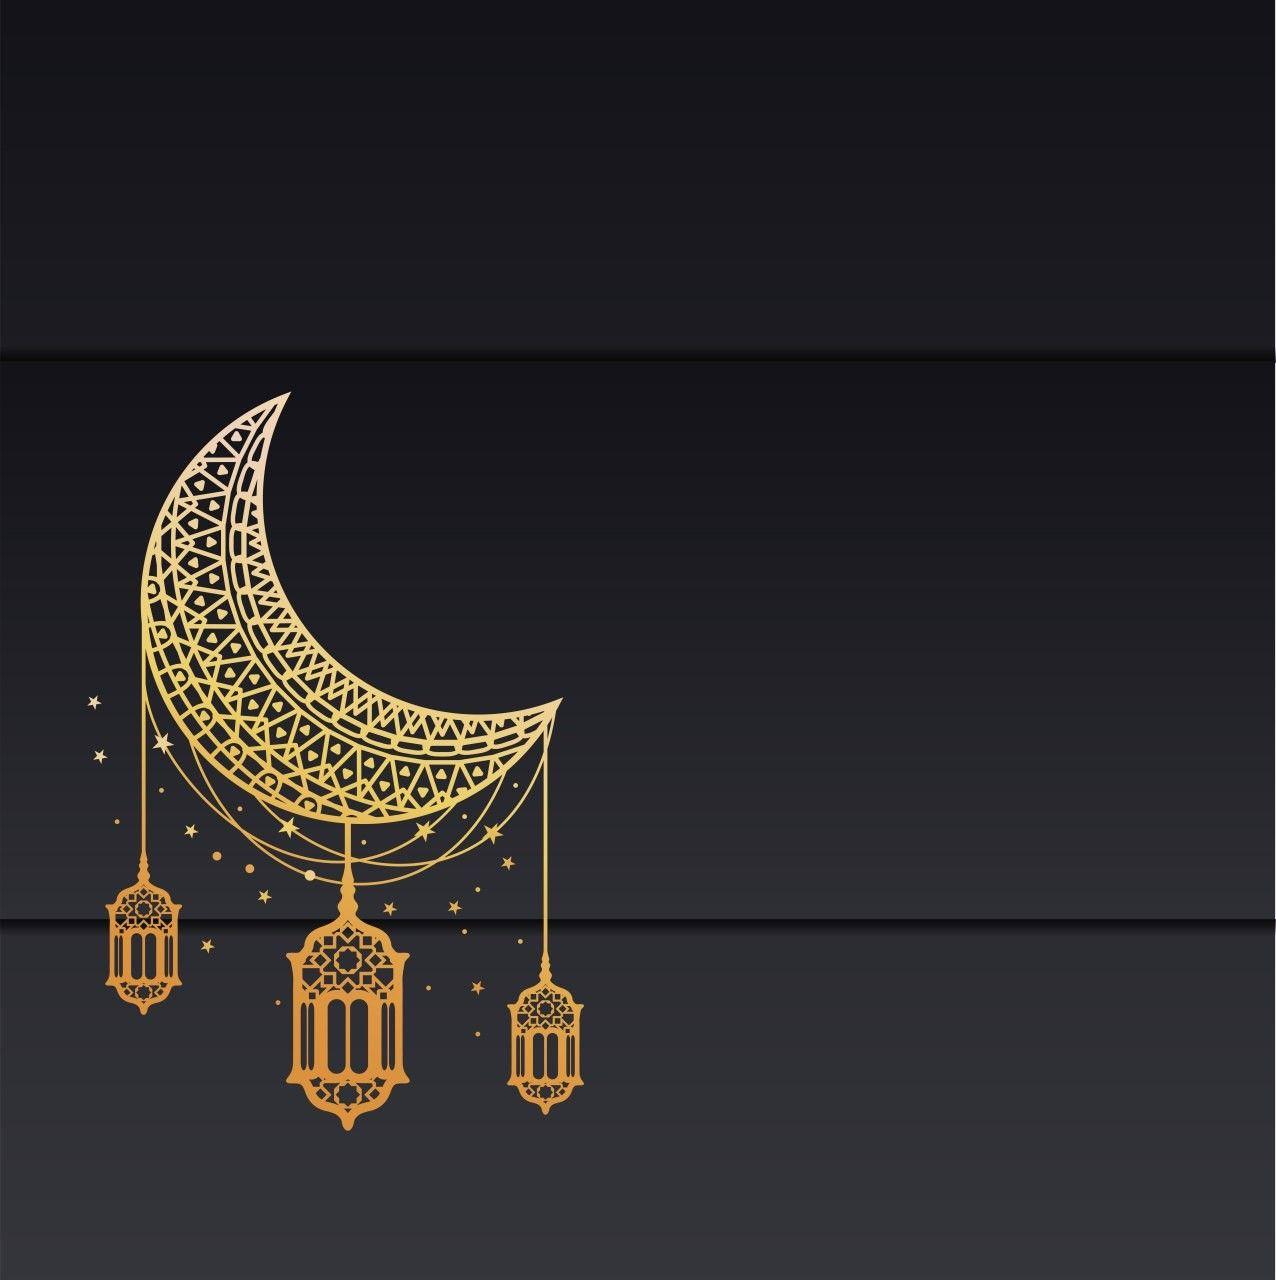 رمضان كريم كل عام وانتم بخير Desain Grafis Spanduk Seni Islamis